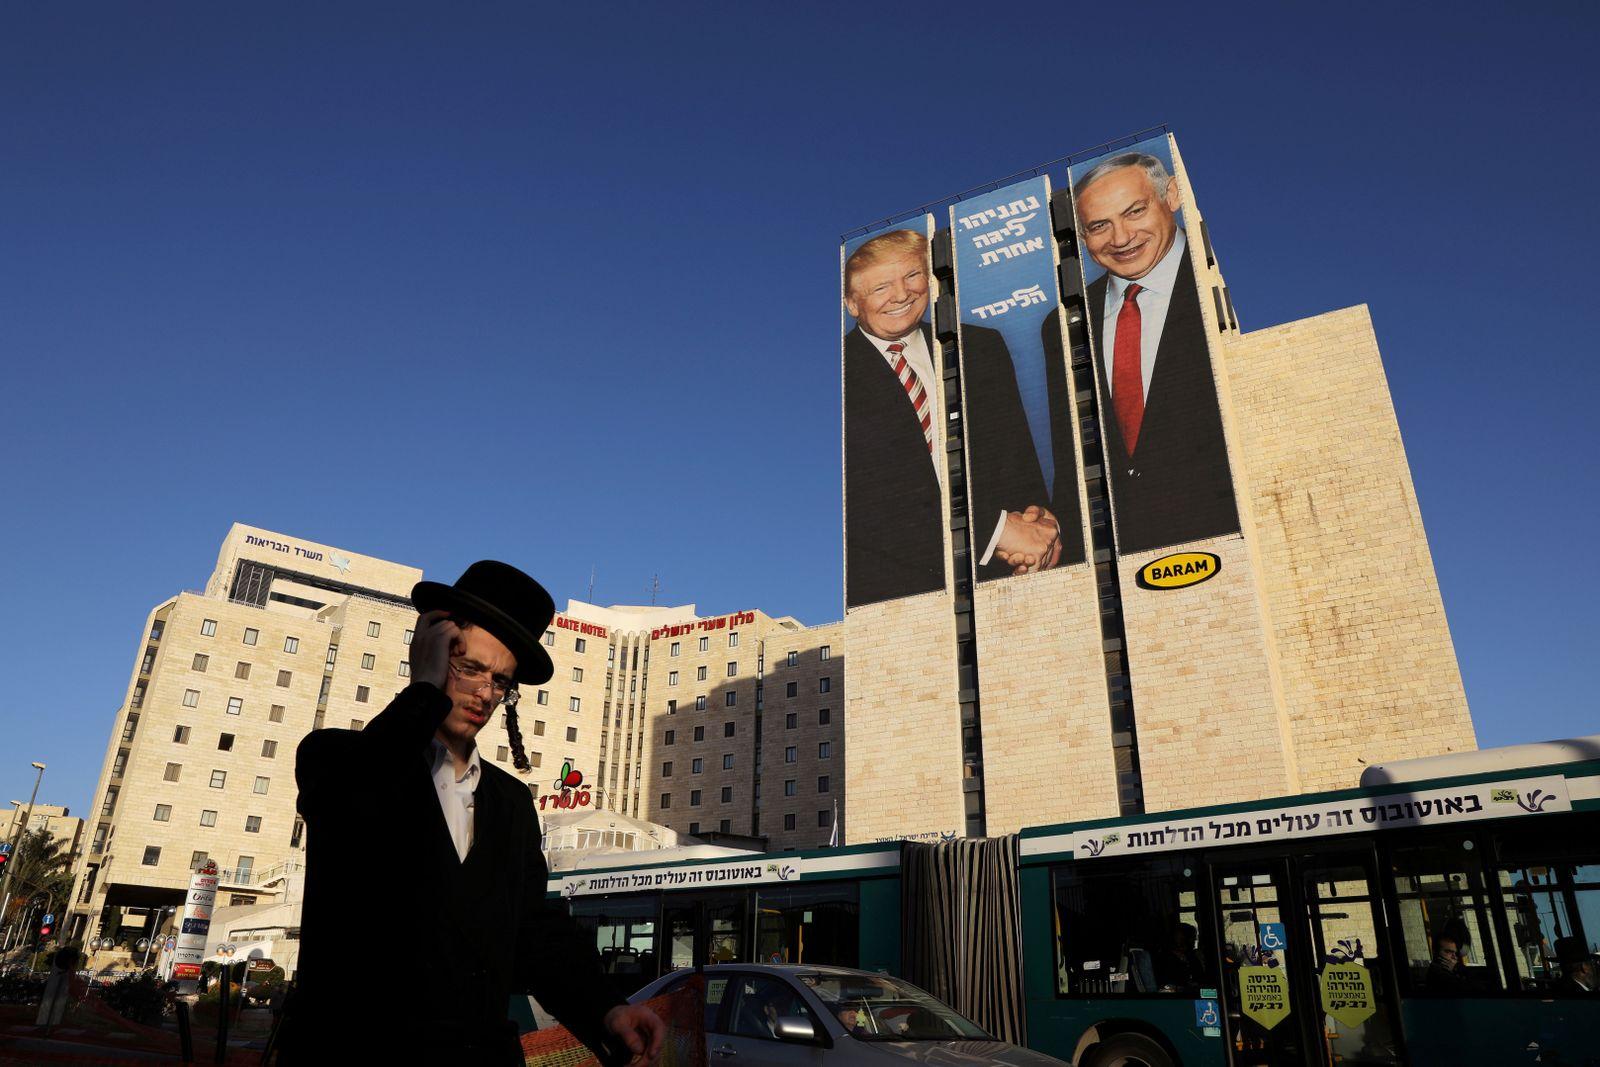 Israel-Wahlplakat